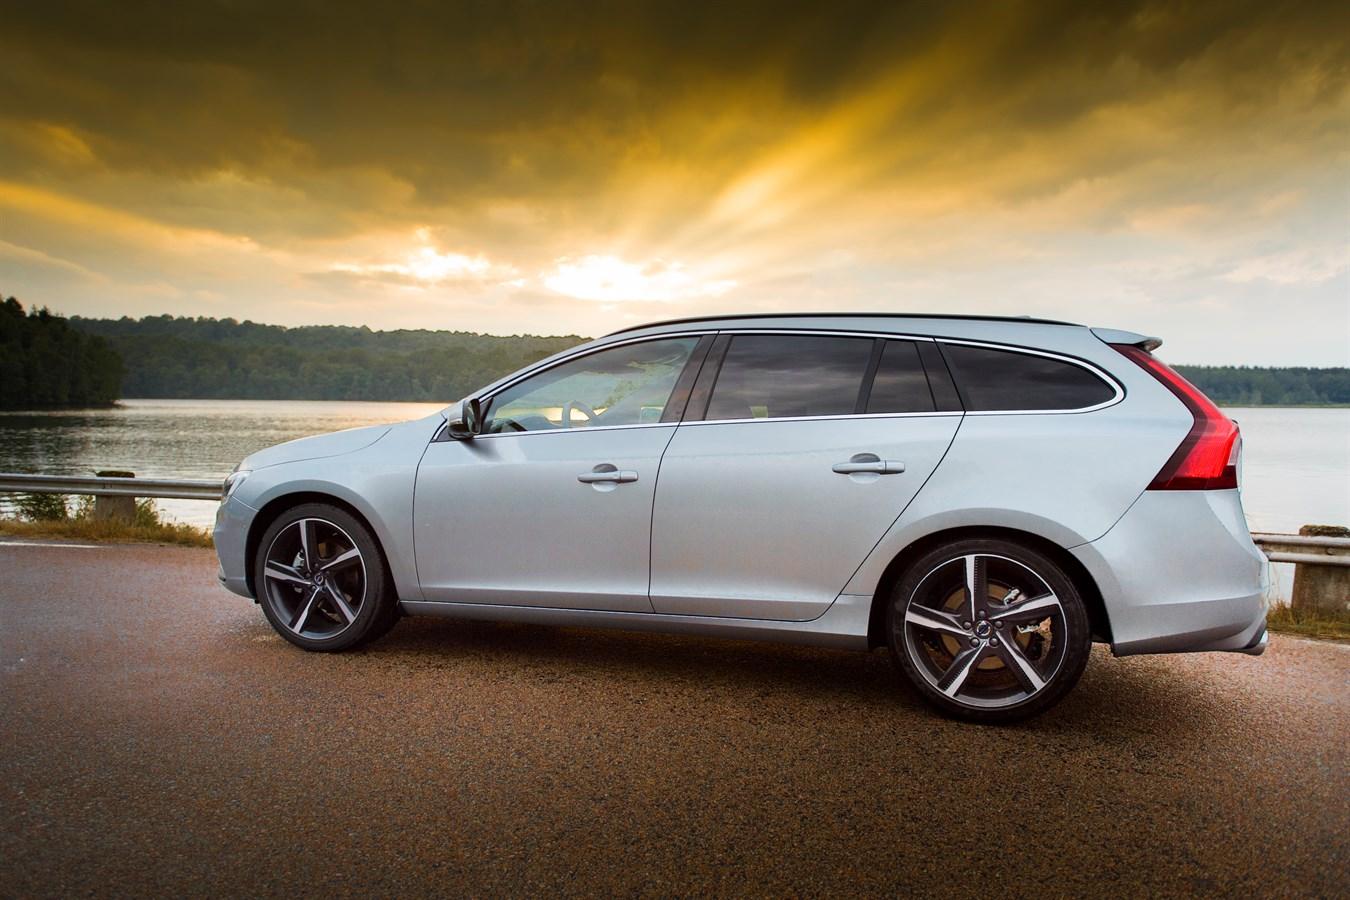 Modelle 2017 V60 Fotos Volvo Car Austria Pressezentrum